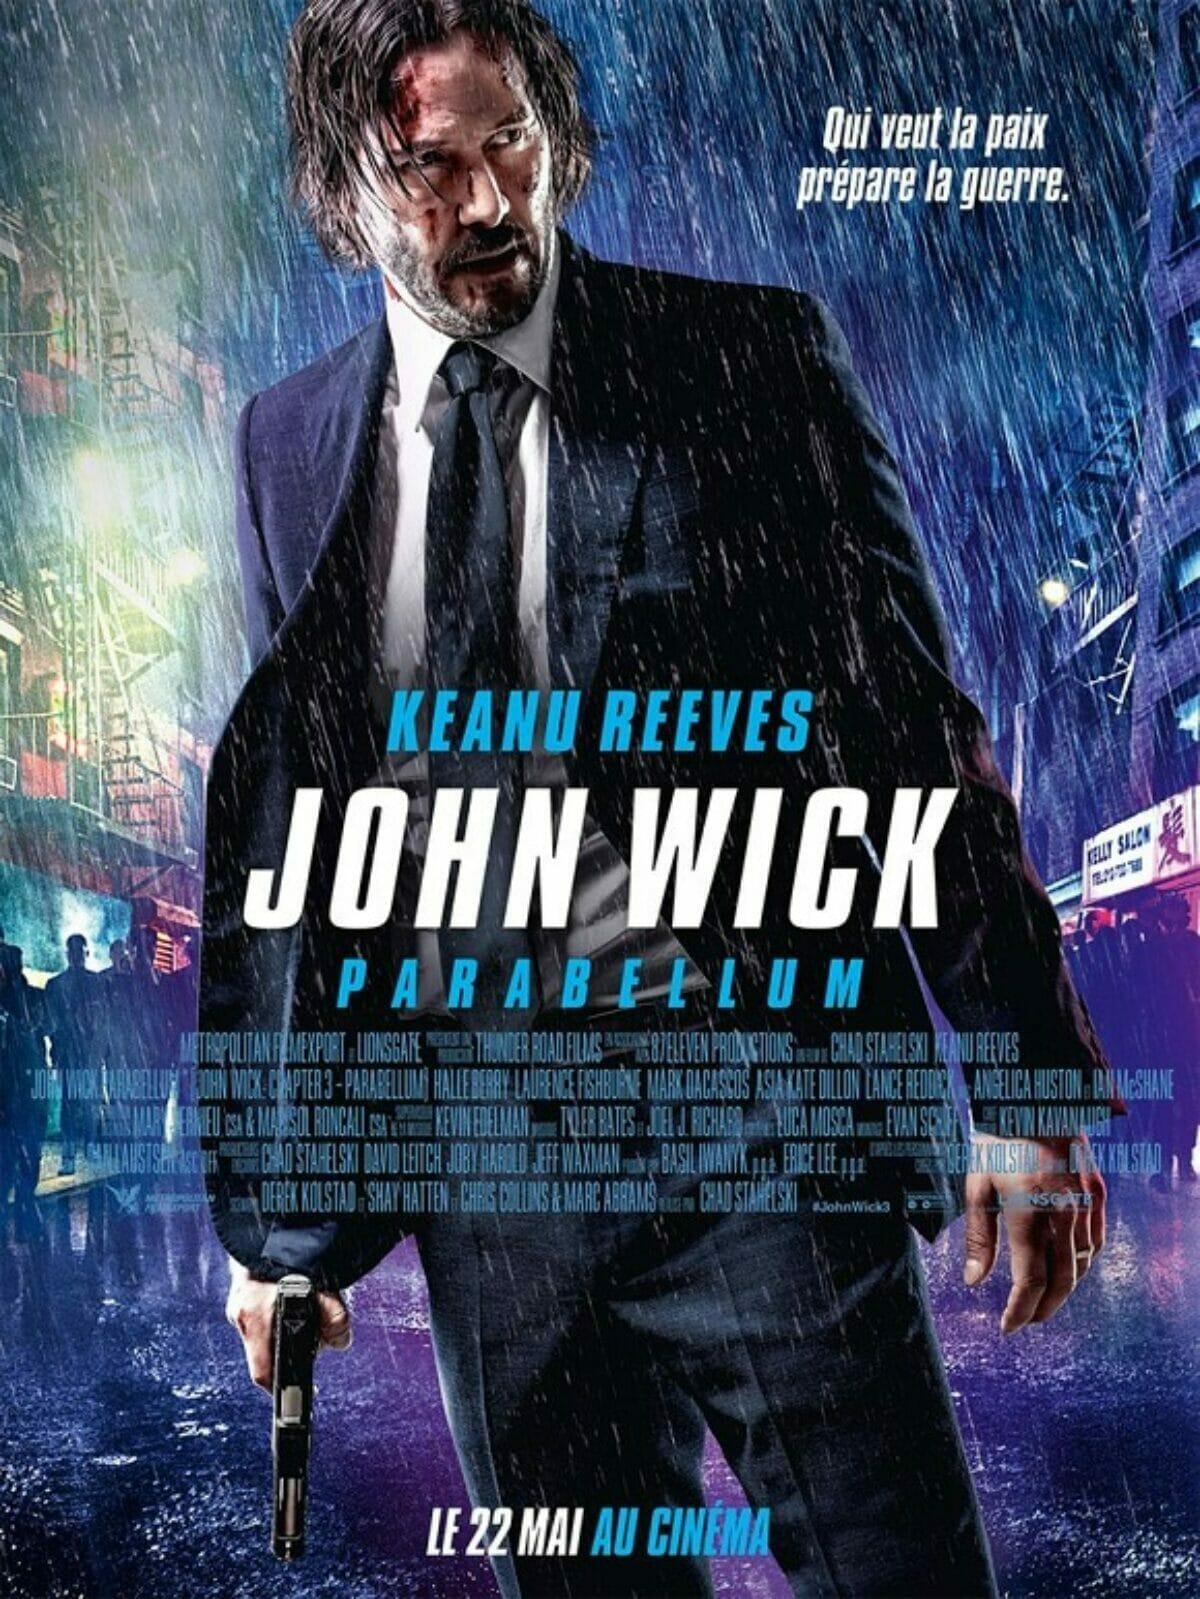 John-Wick-Parabellum-poster